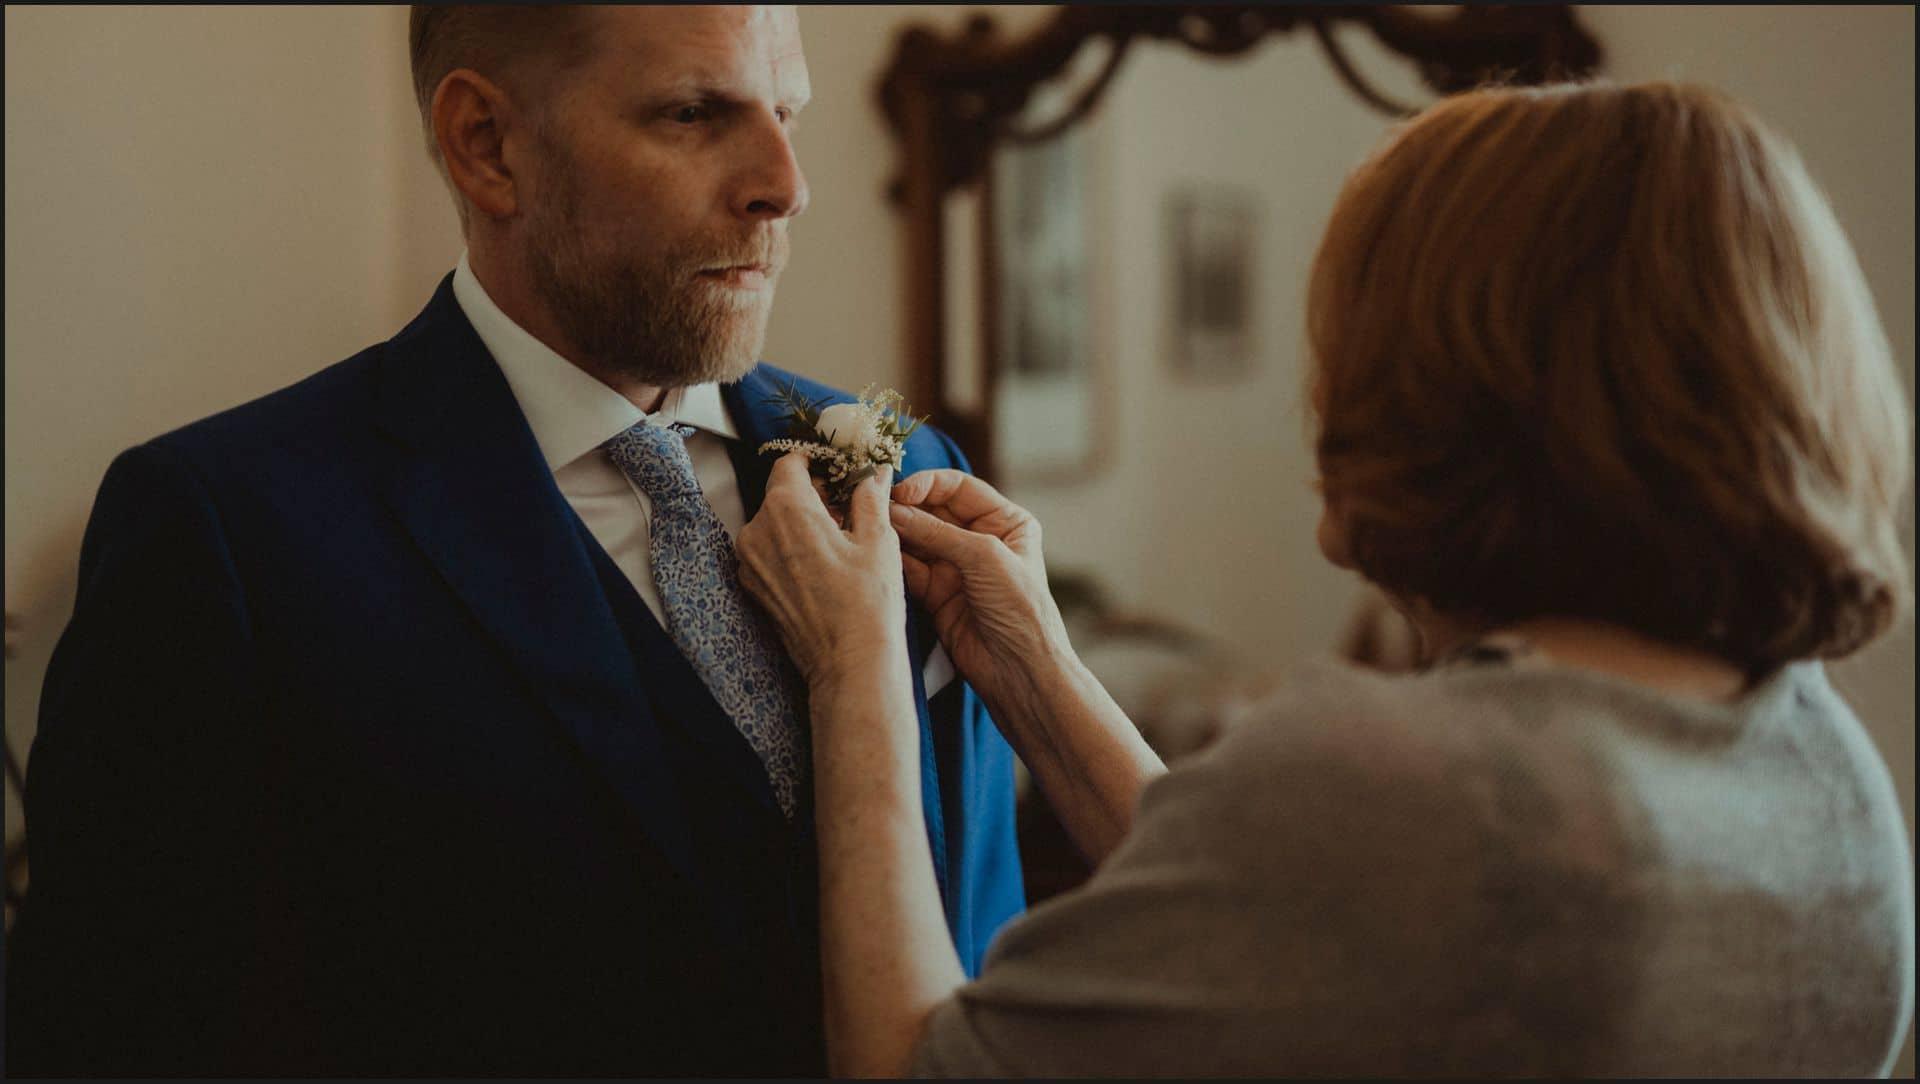 tuscany, destination wedding, chianti, flowers, groom